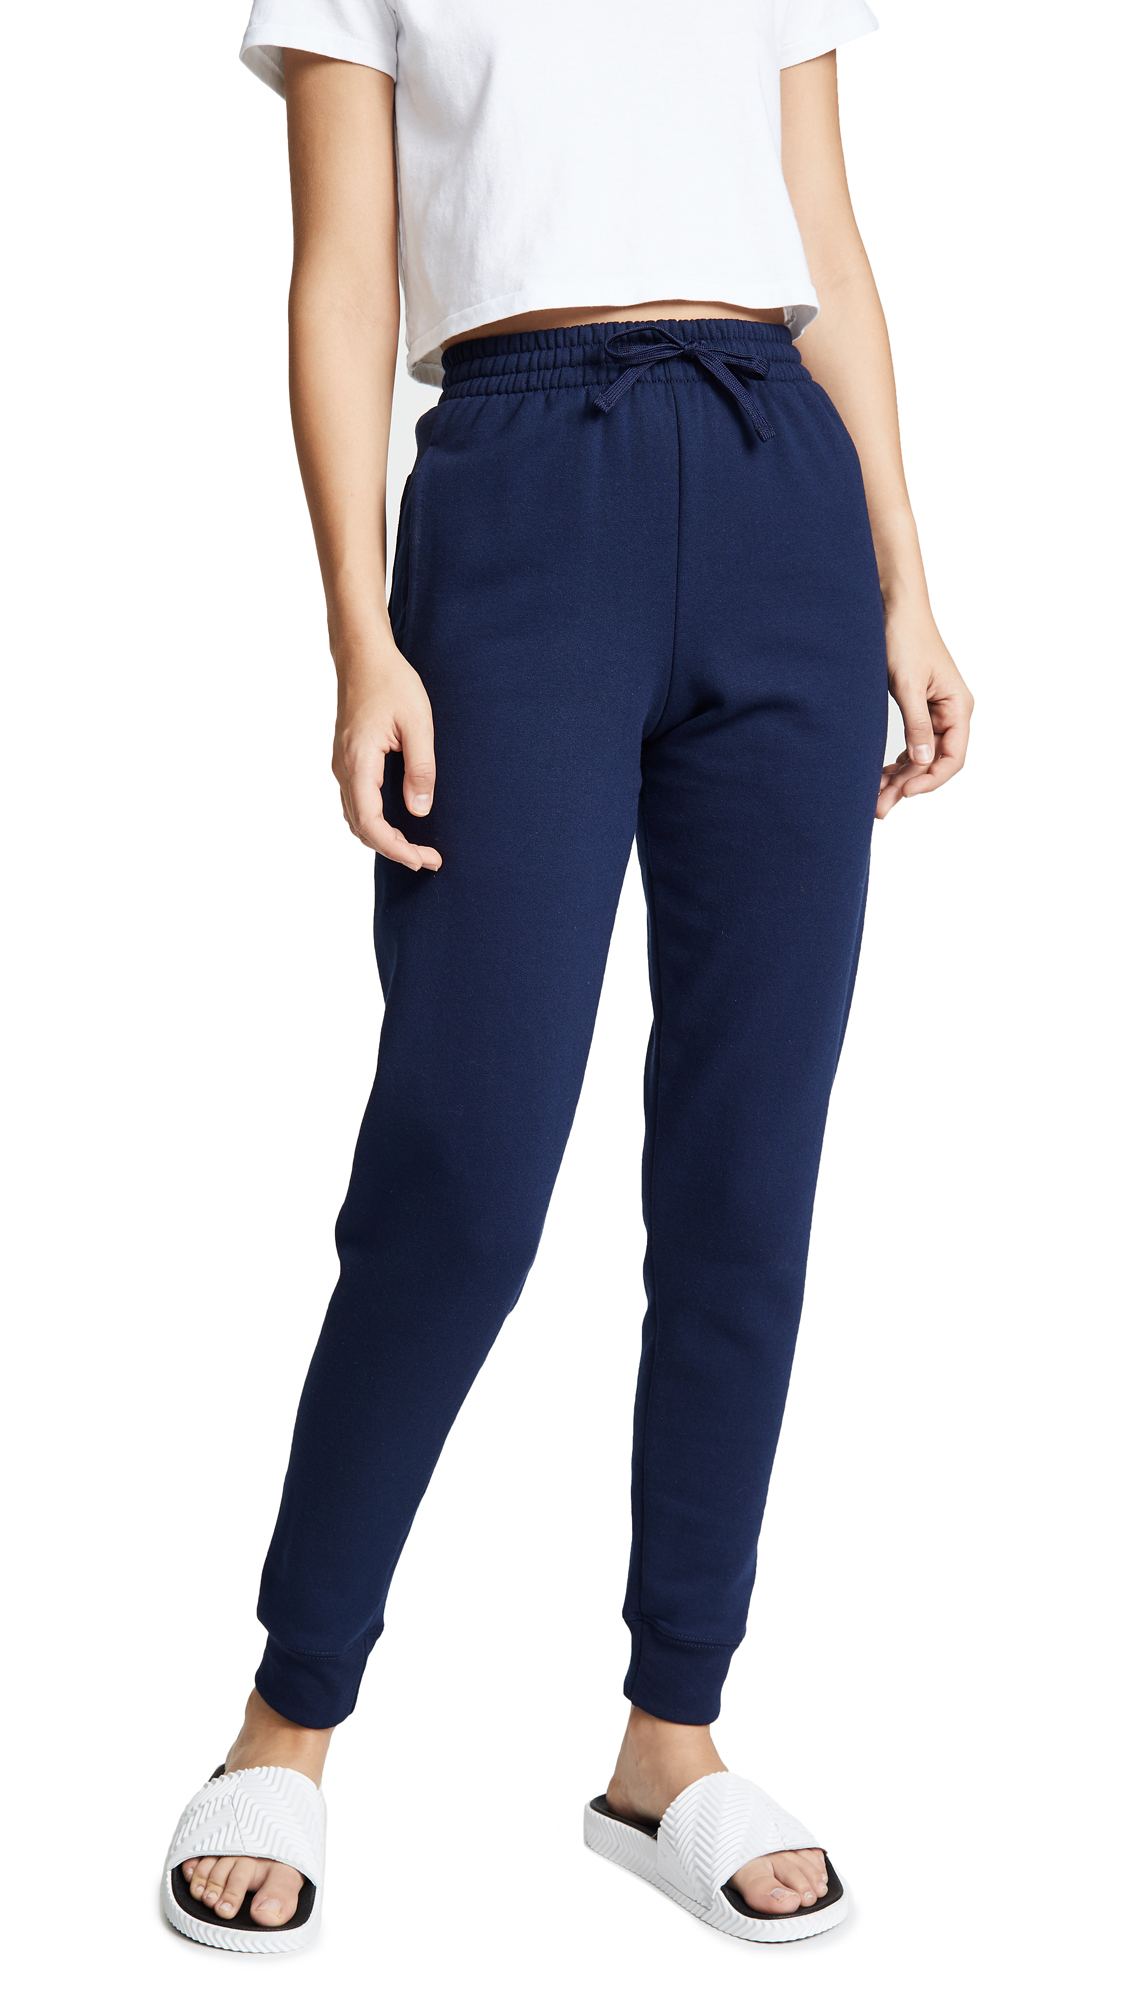 Cedric Charlier Drawstring Pants - Blue